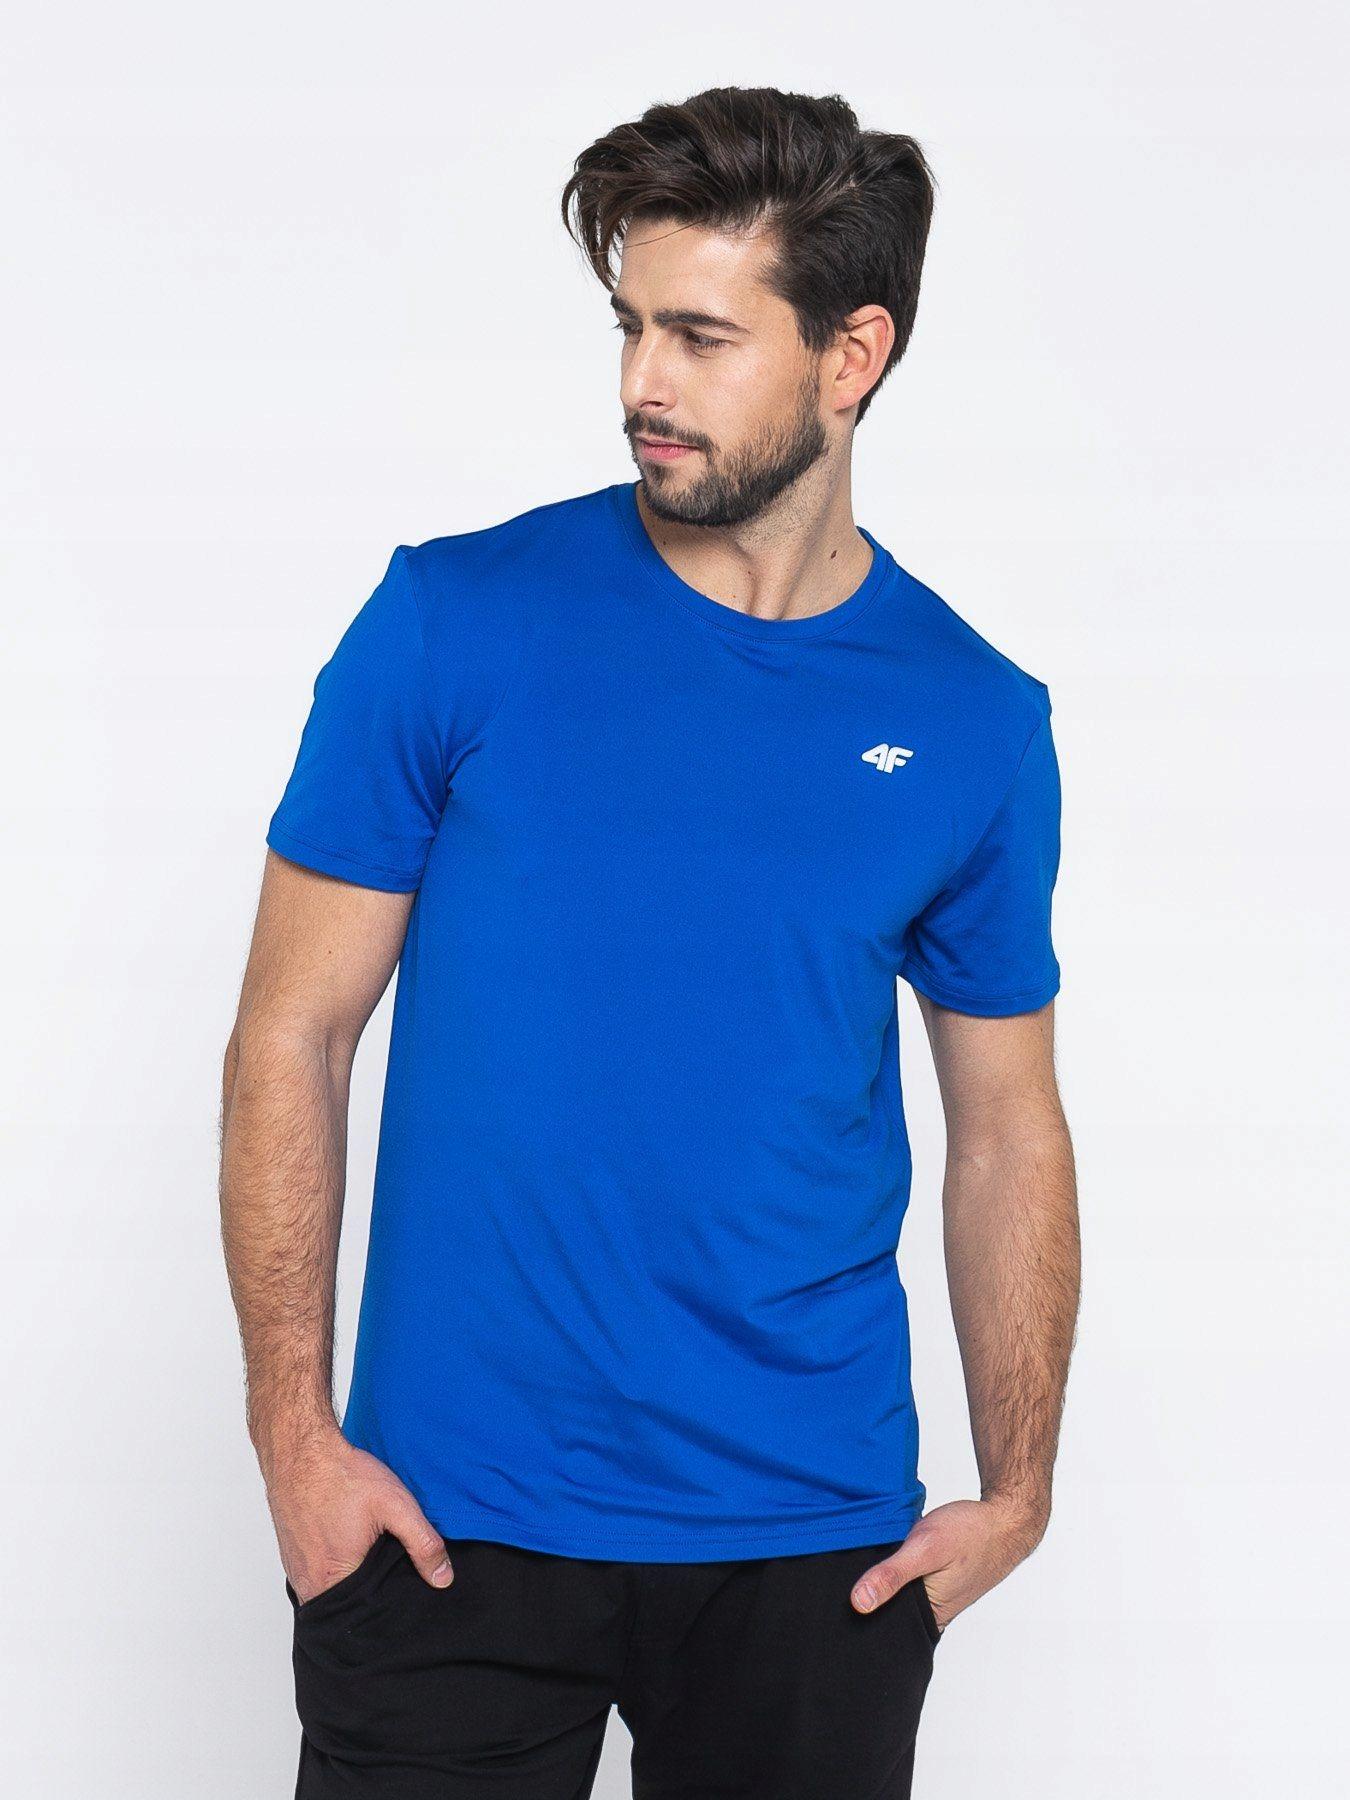 4F Koszulka męska funkcyjna termoaktywna TSMF002